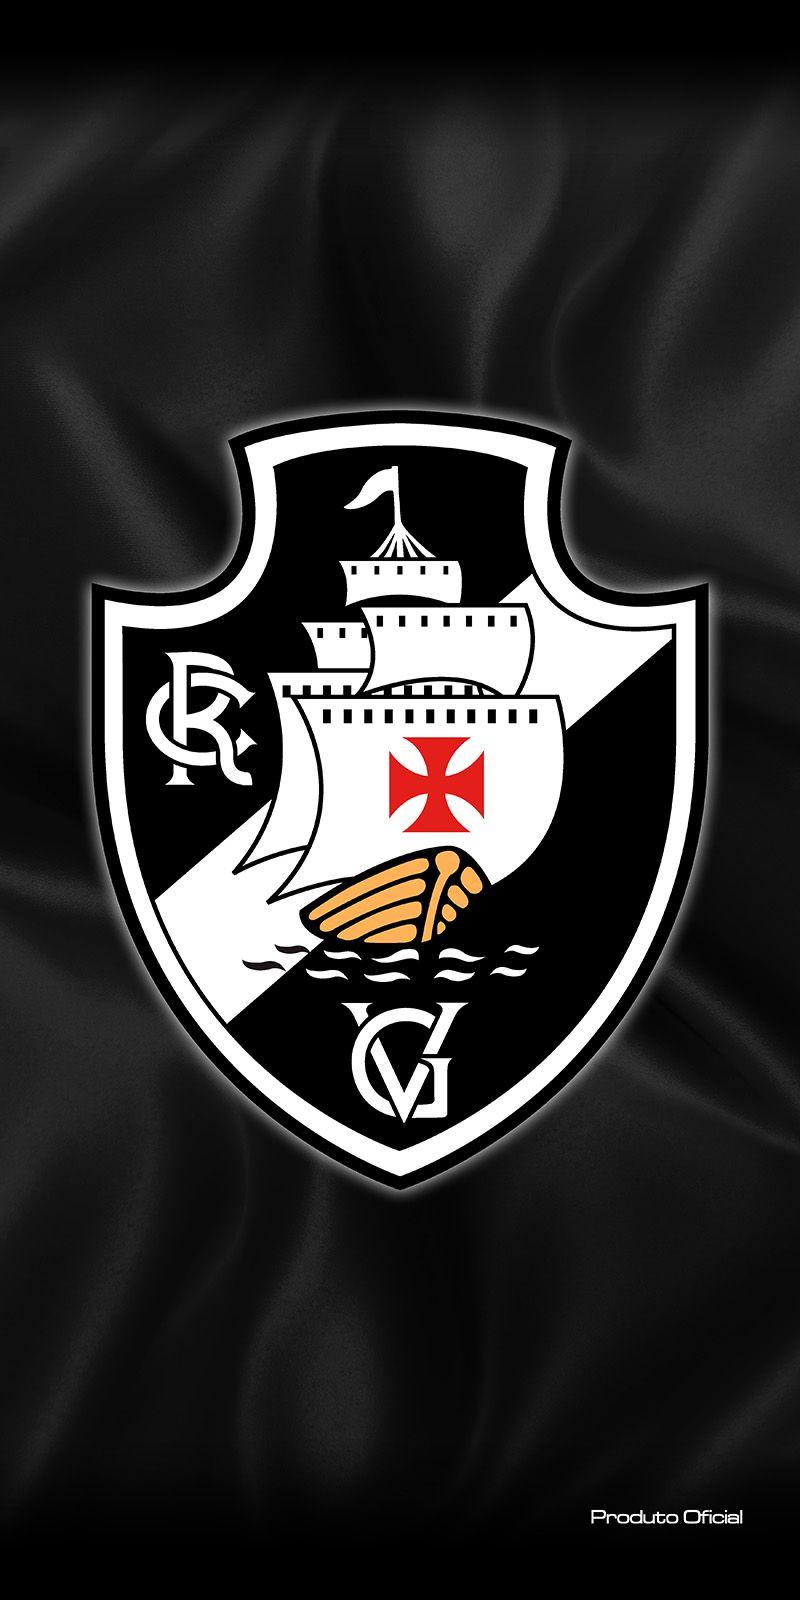 Toalha Felpuda Time de Futebol - Vasco | Buettner